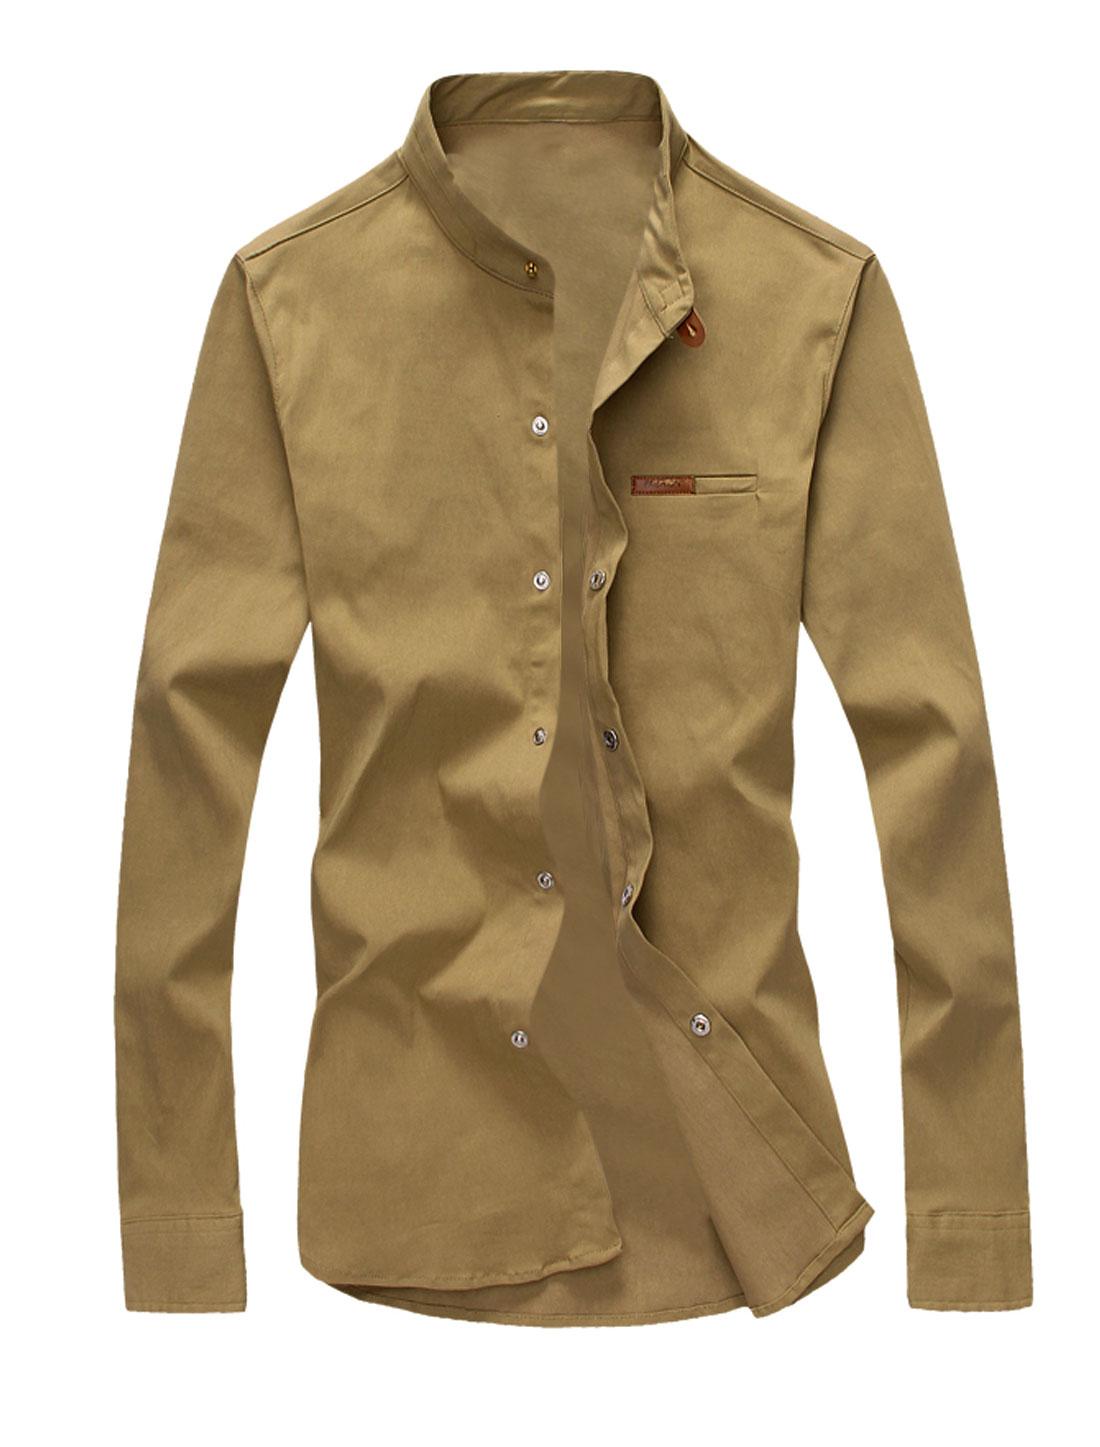 Man Snap Fastener Up Long Sleeves Casual Shirt Khaki M